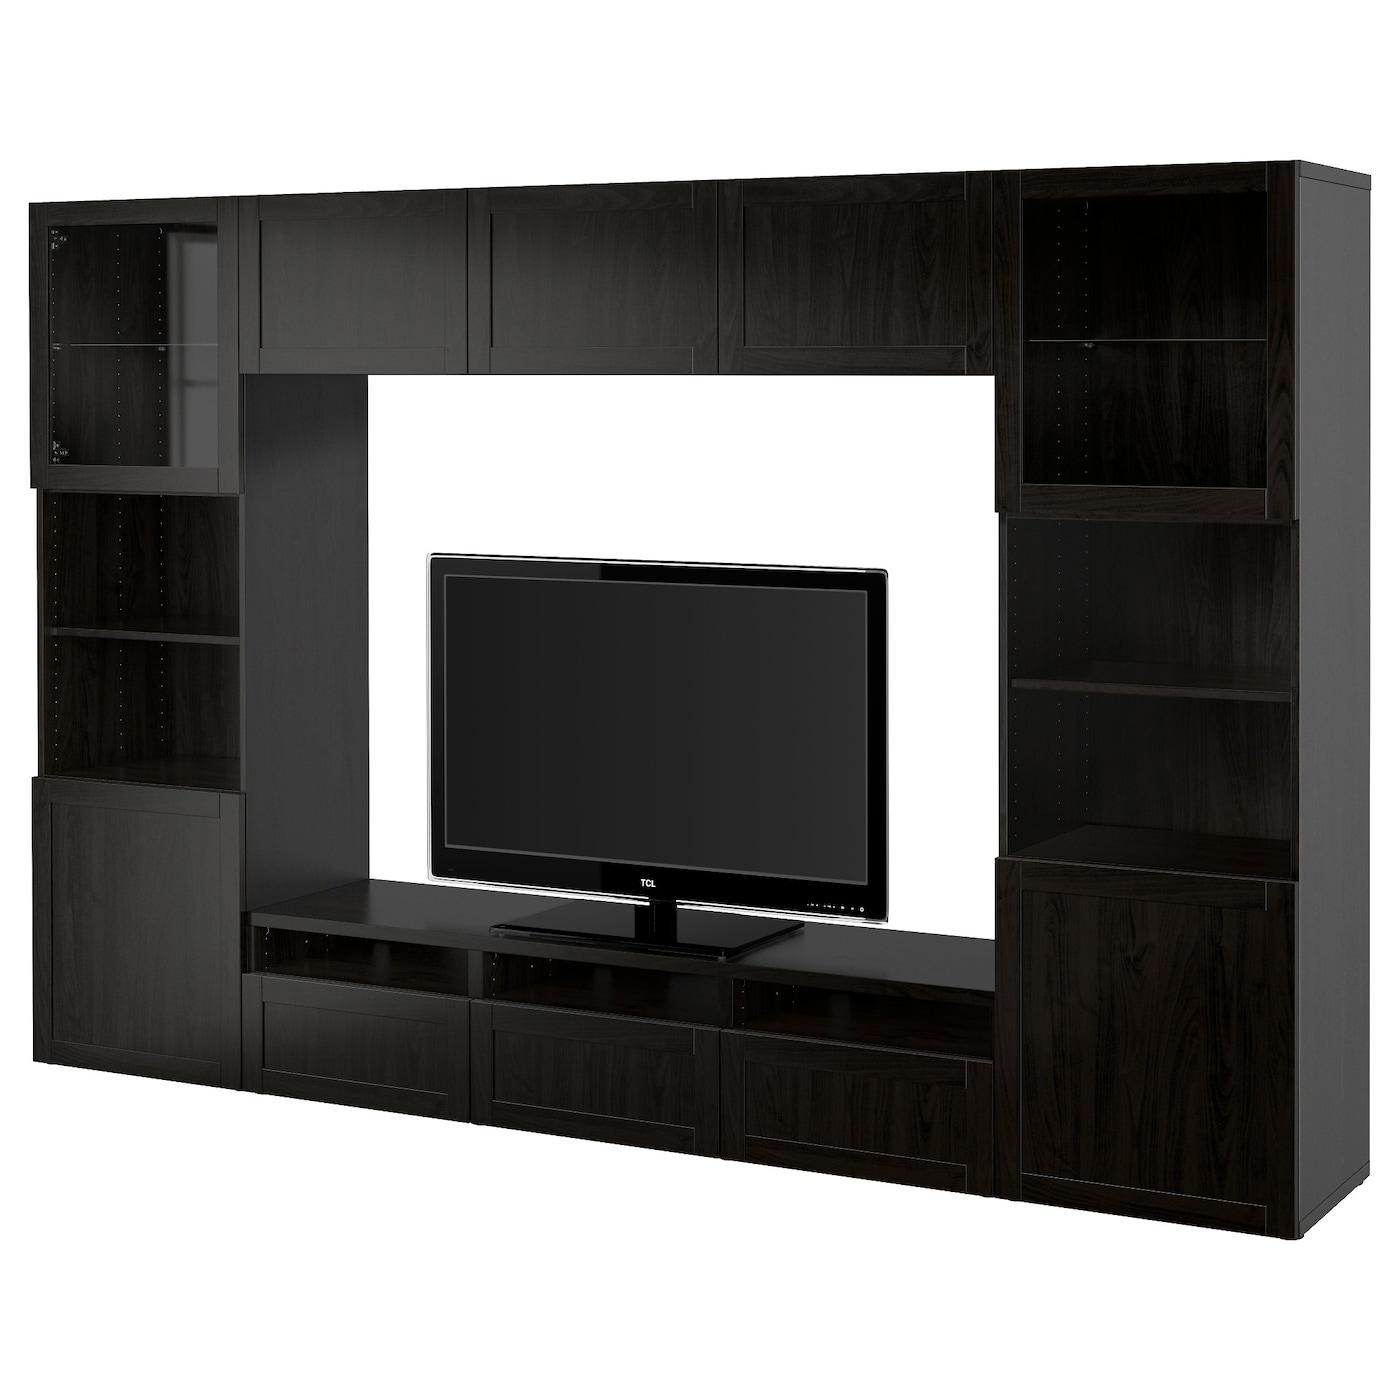 Meuble Ikea Besta Brun Noir